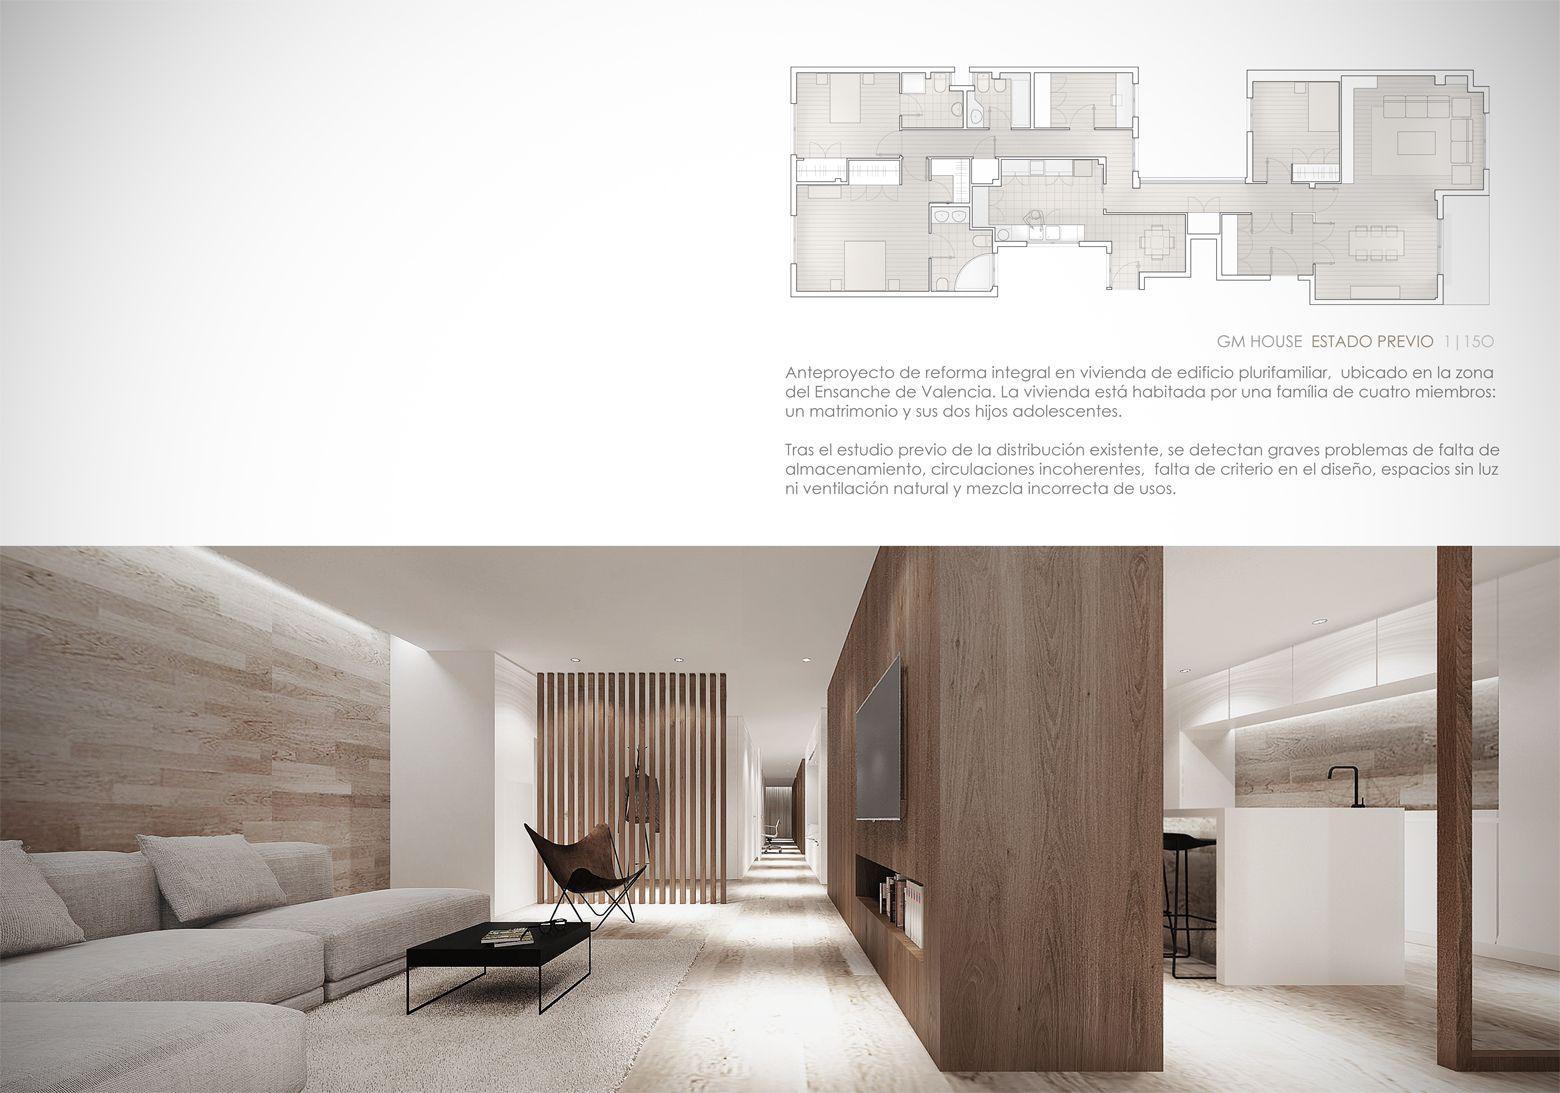 onside | arquitectura · interior · diseño | Dwelling - Vivienda ...